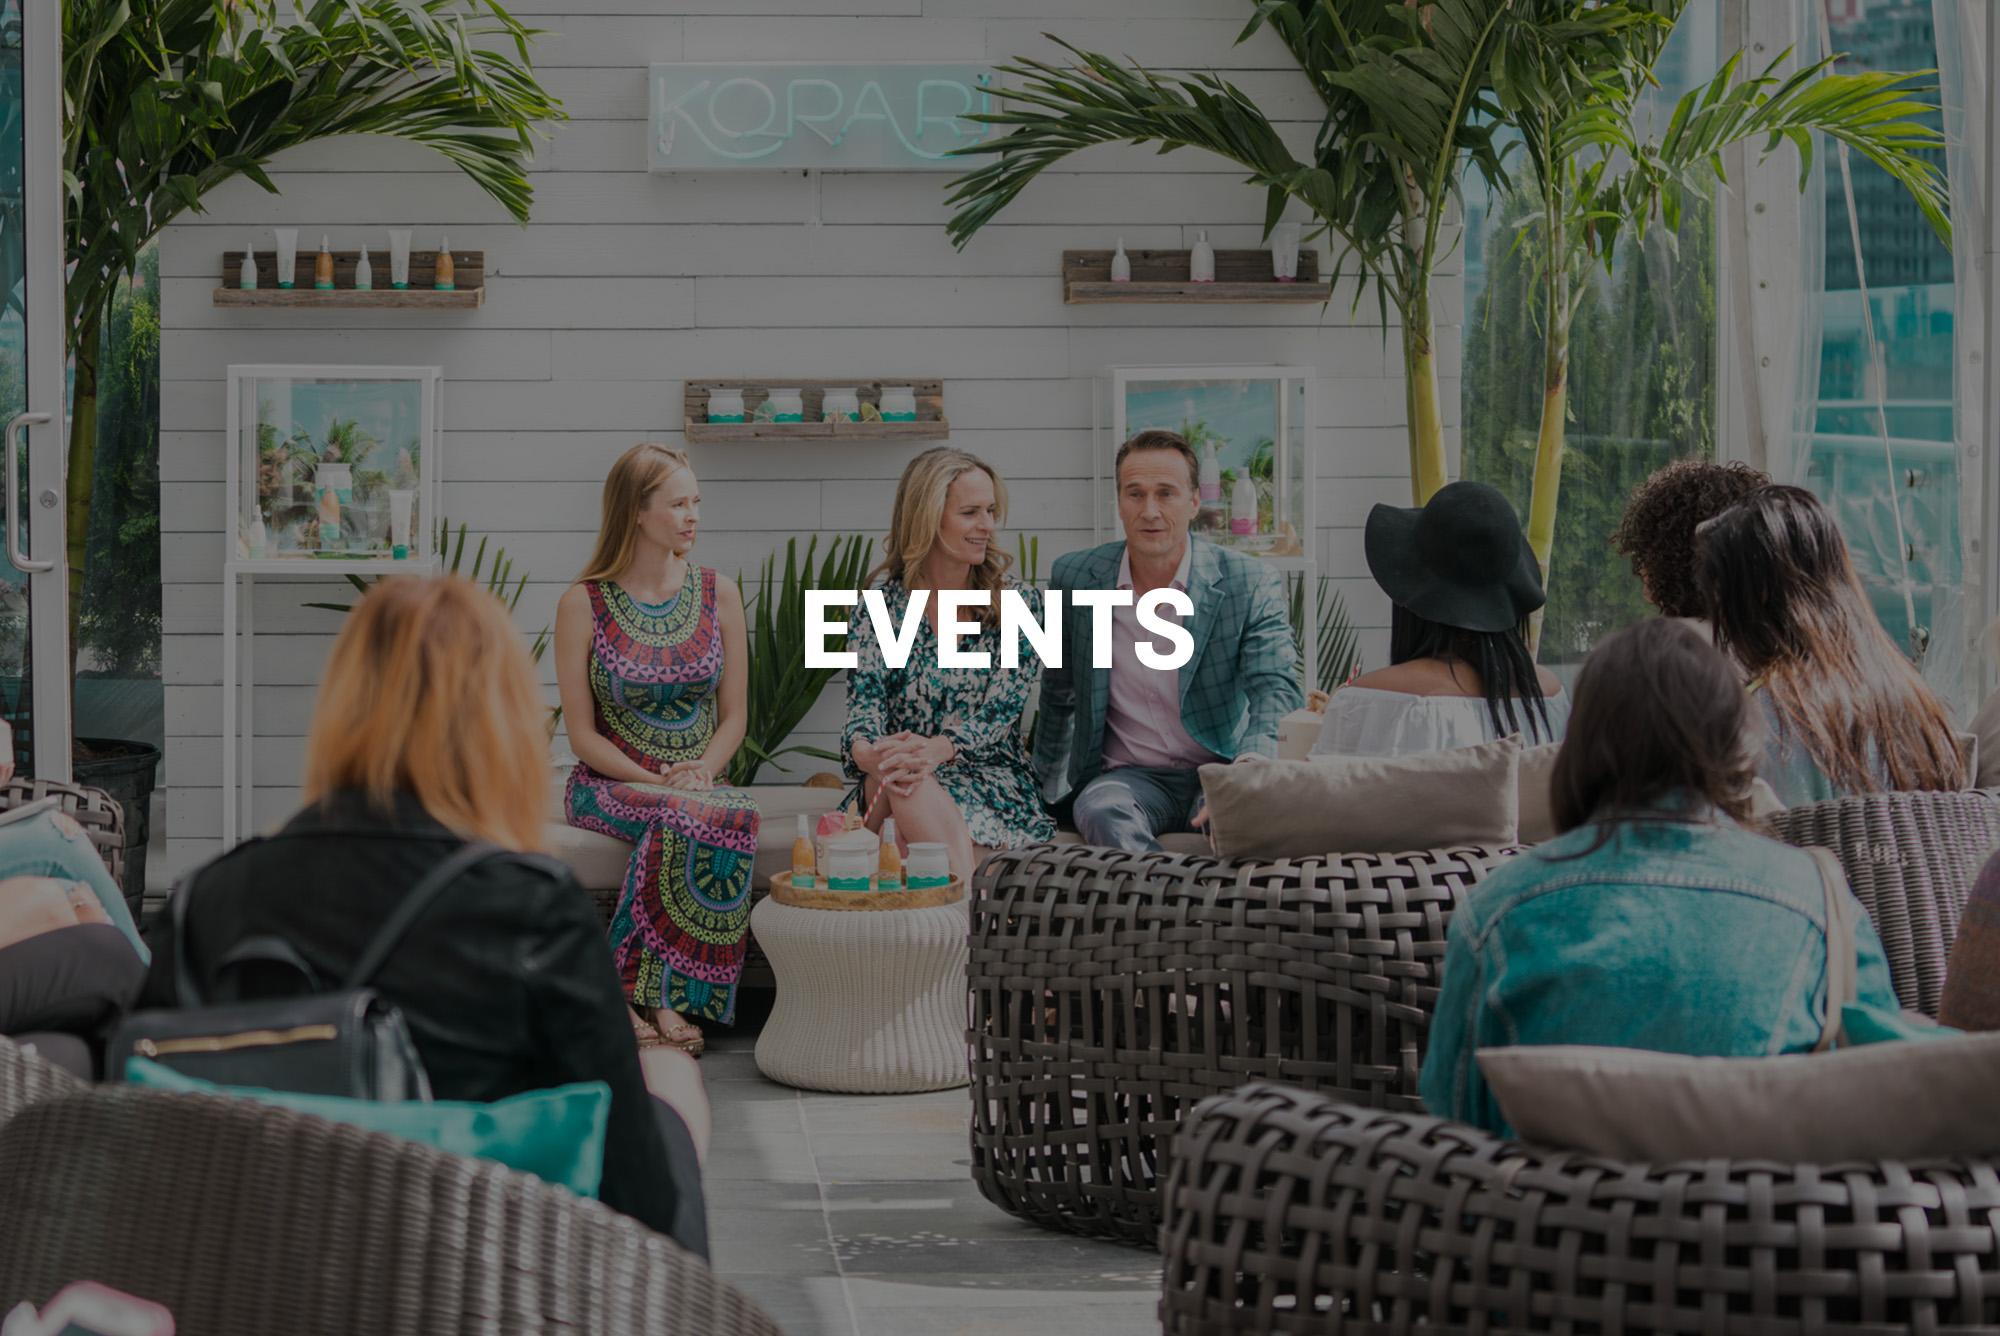 EventsGallery.jpg